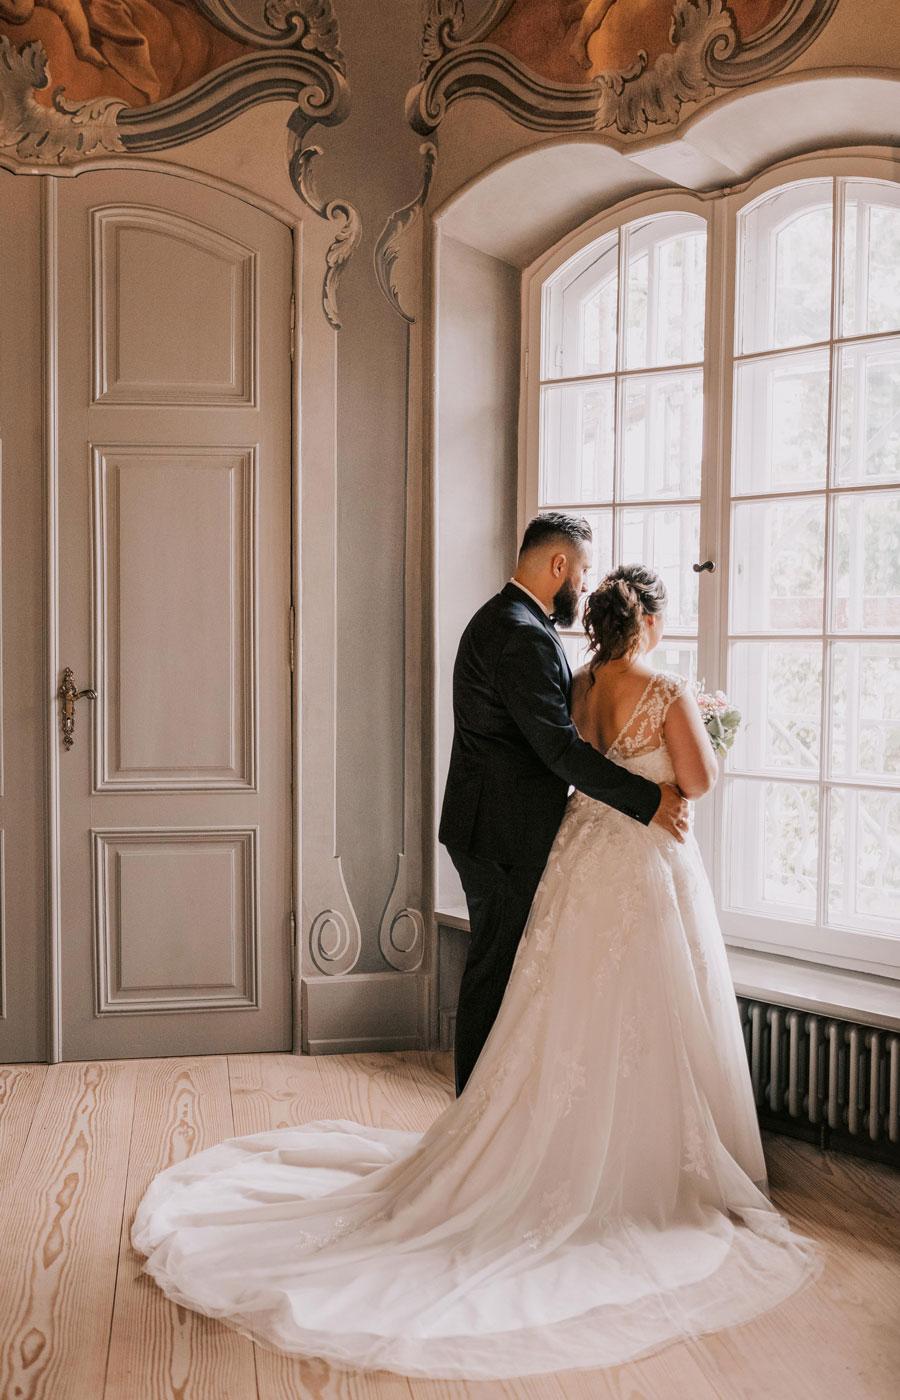 Studioart Photography Hochzeitsshooting Oktober-2